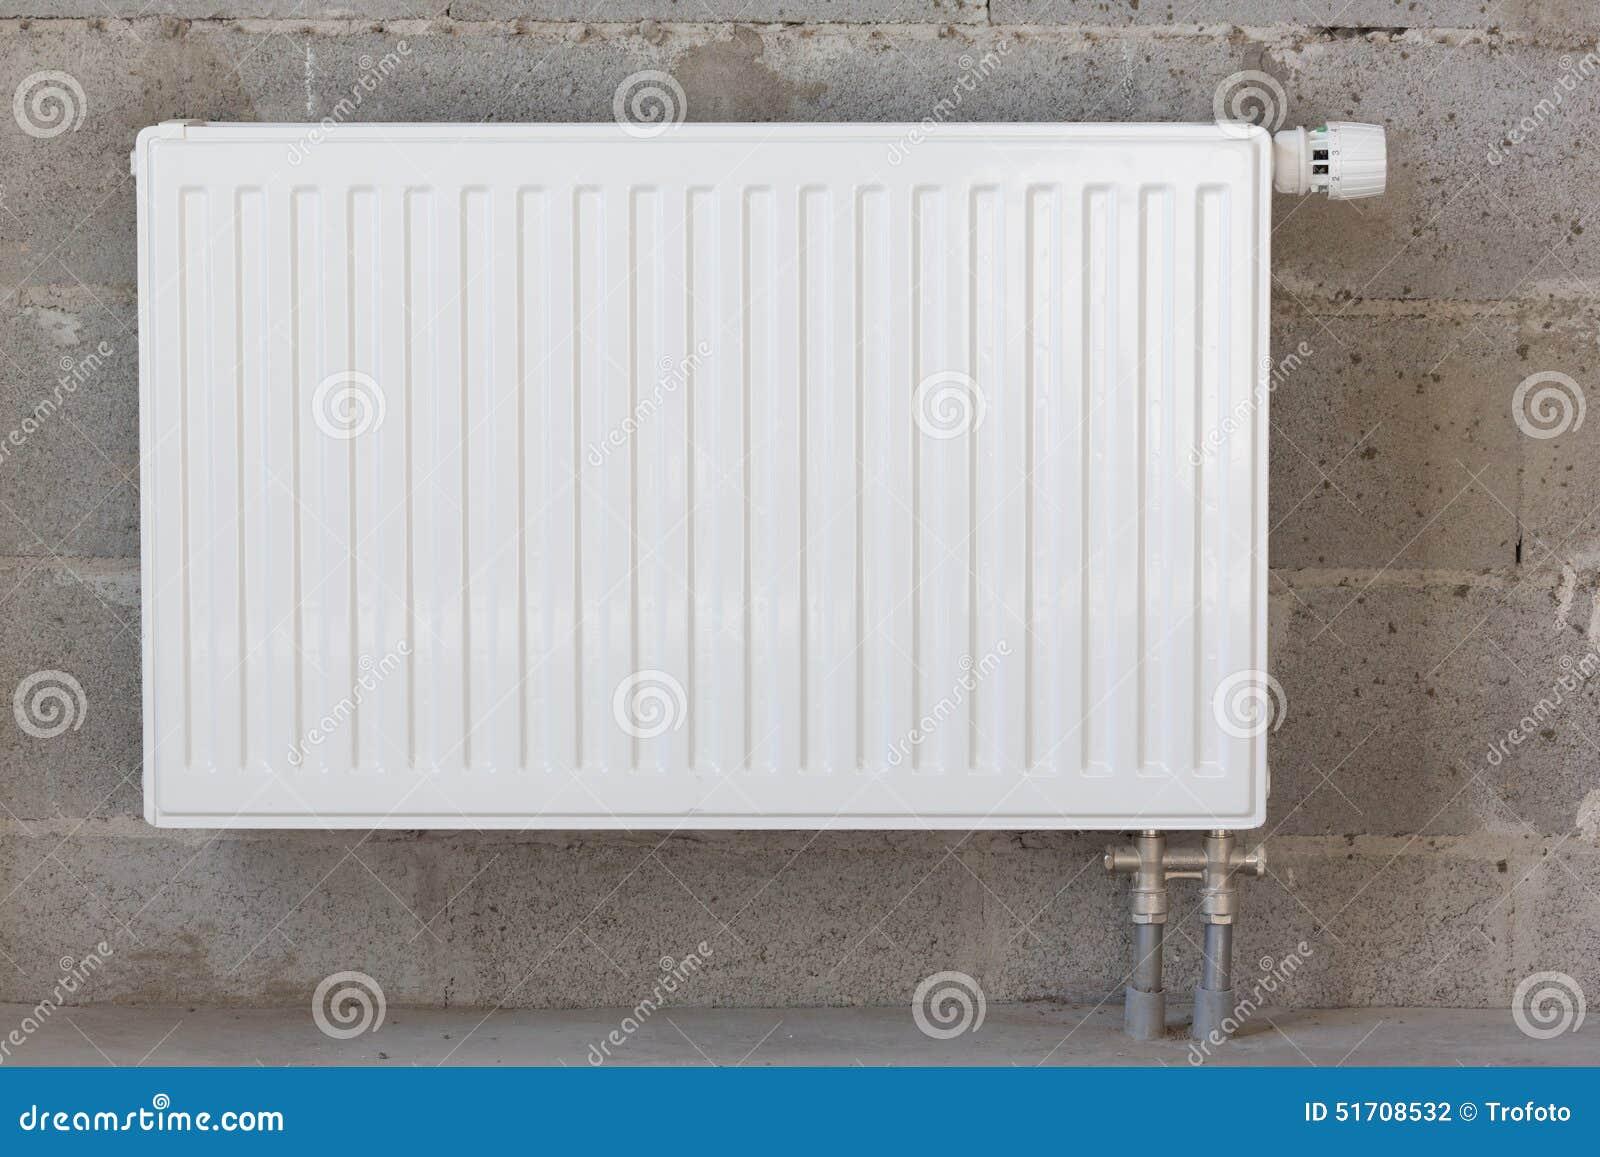 Wiring Diagram Additionally Likewise Free Download Wiring Diagram